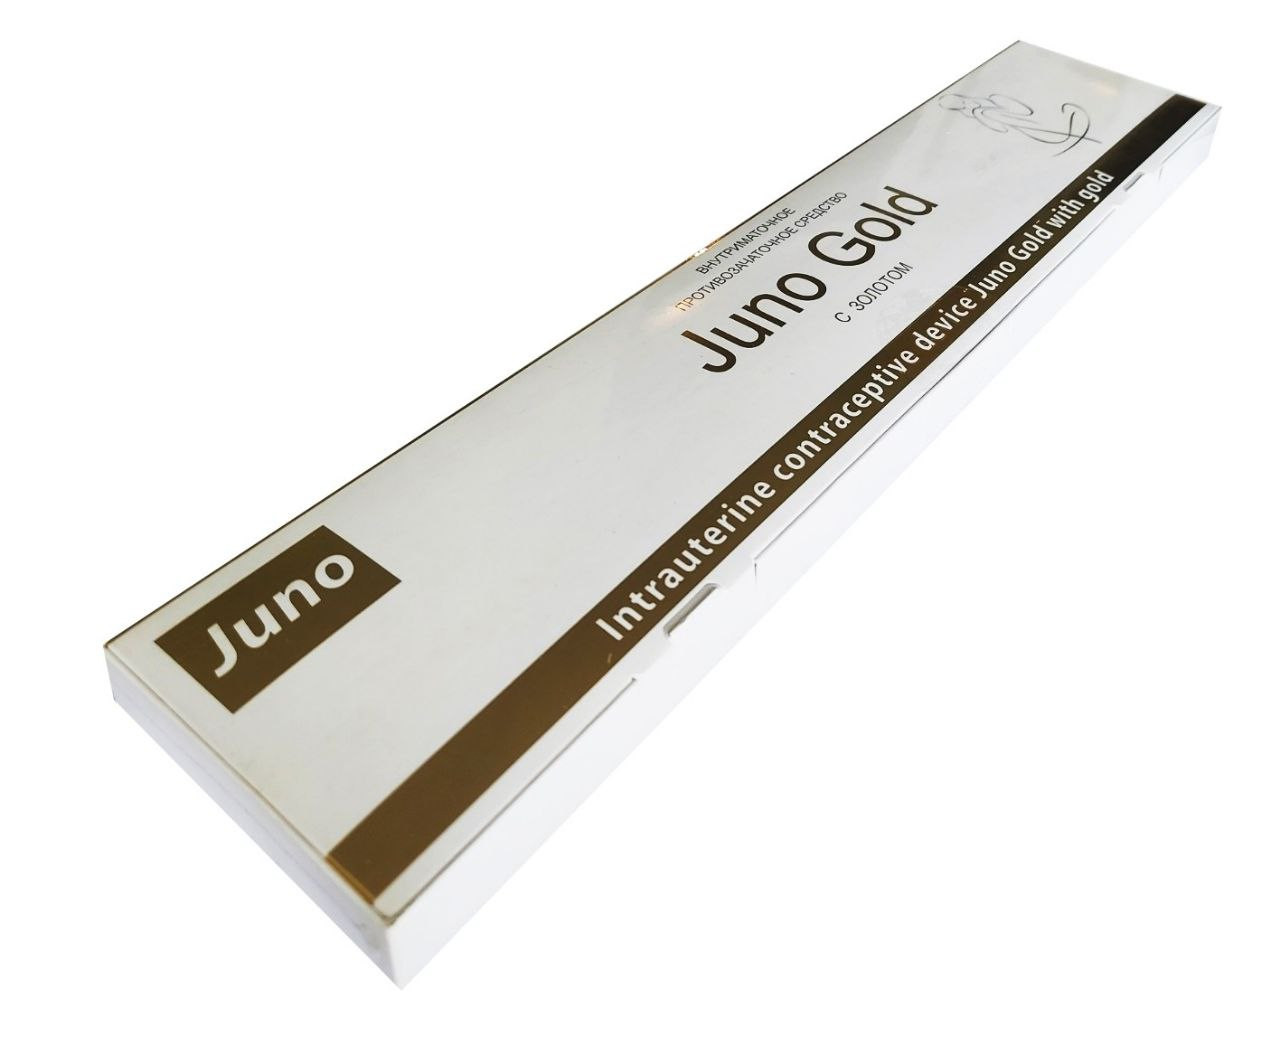 Внутриматочная спираль Юнона Juno Gold - Фото 3